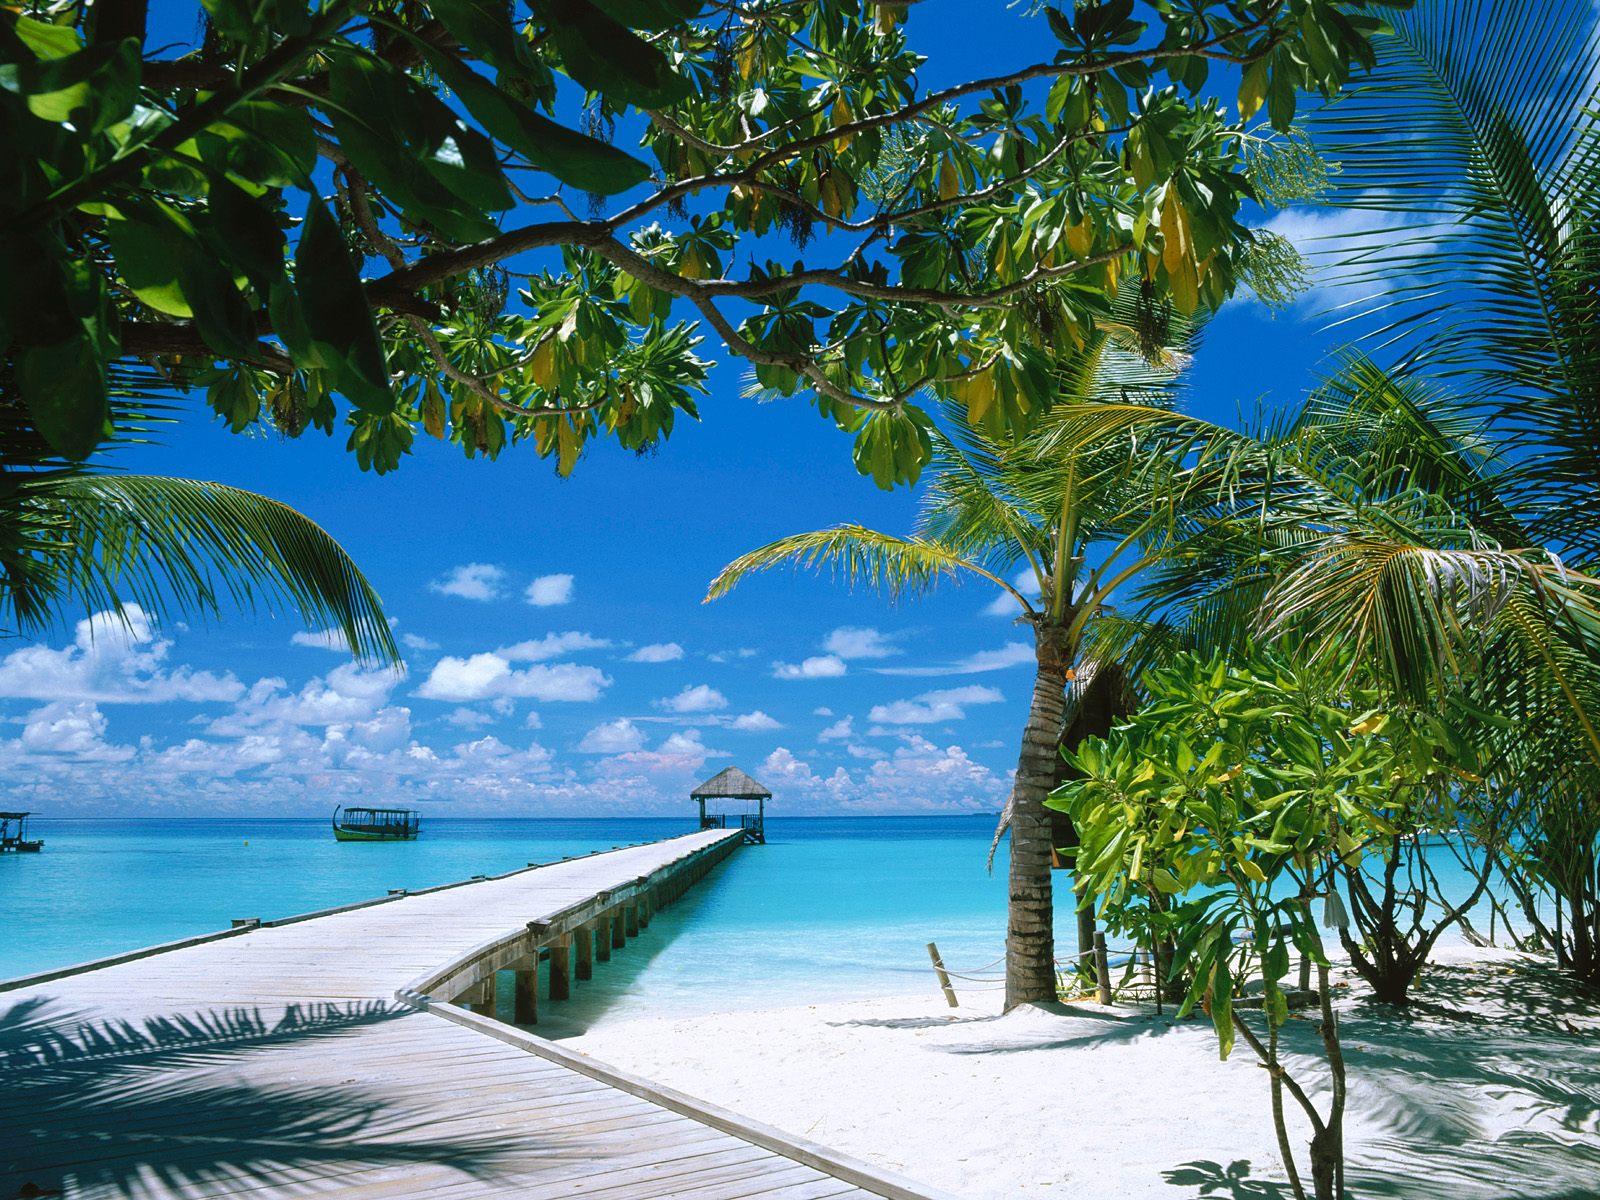 Beautiful Beach   Wallpaper 10938 1600x1200